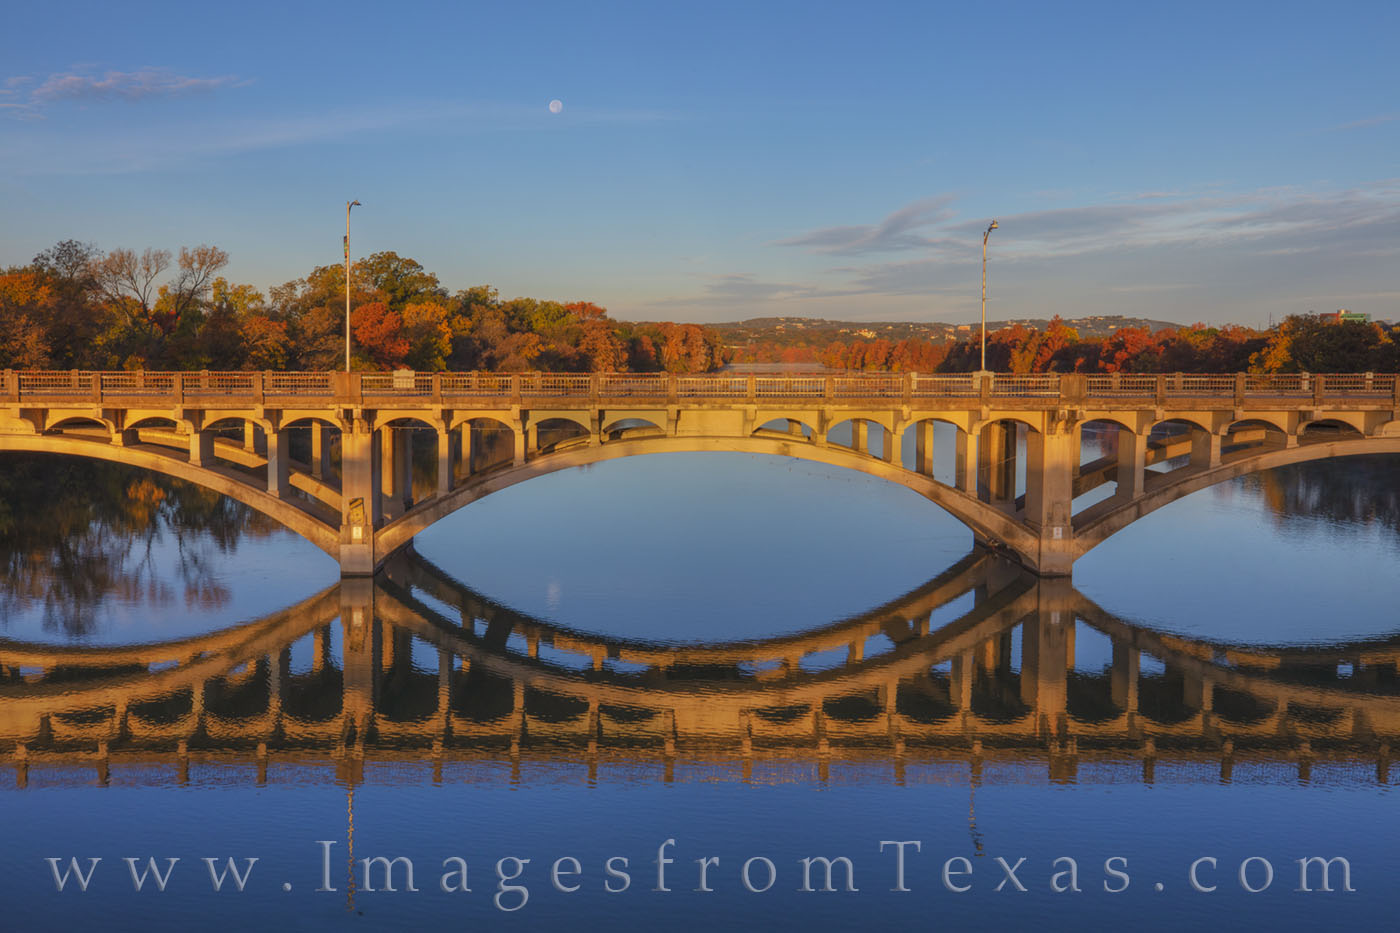 lamar bridge, austin texas, austin images, ladybird lake, full moon, november, autumn, reflection, morning, austin bridges, bridges, photo